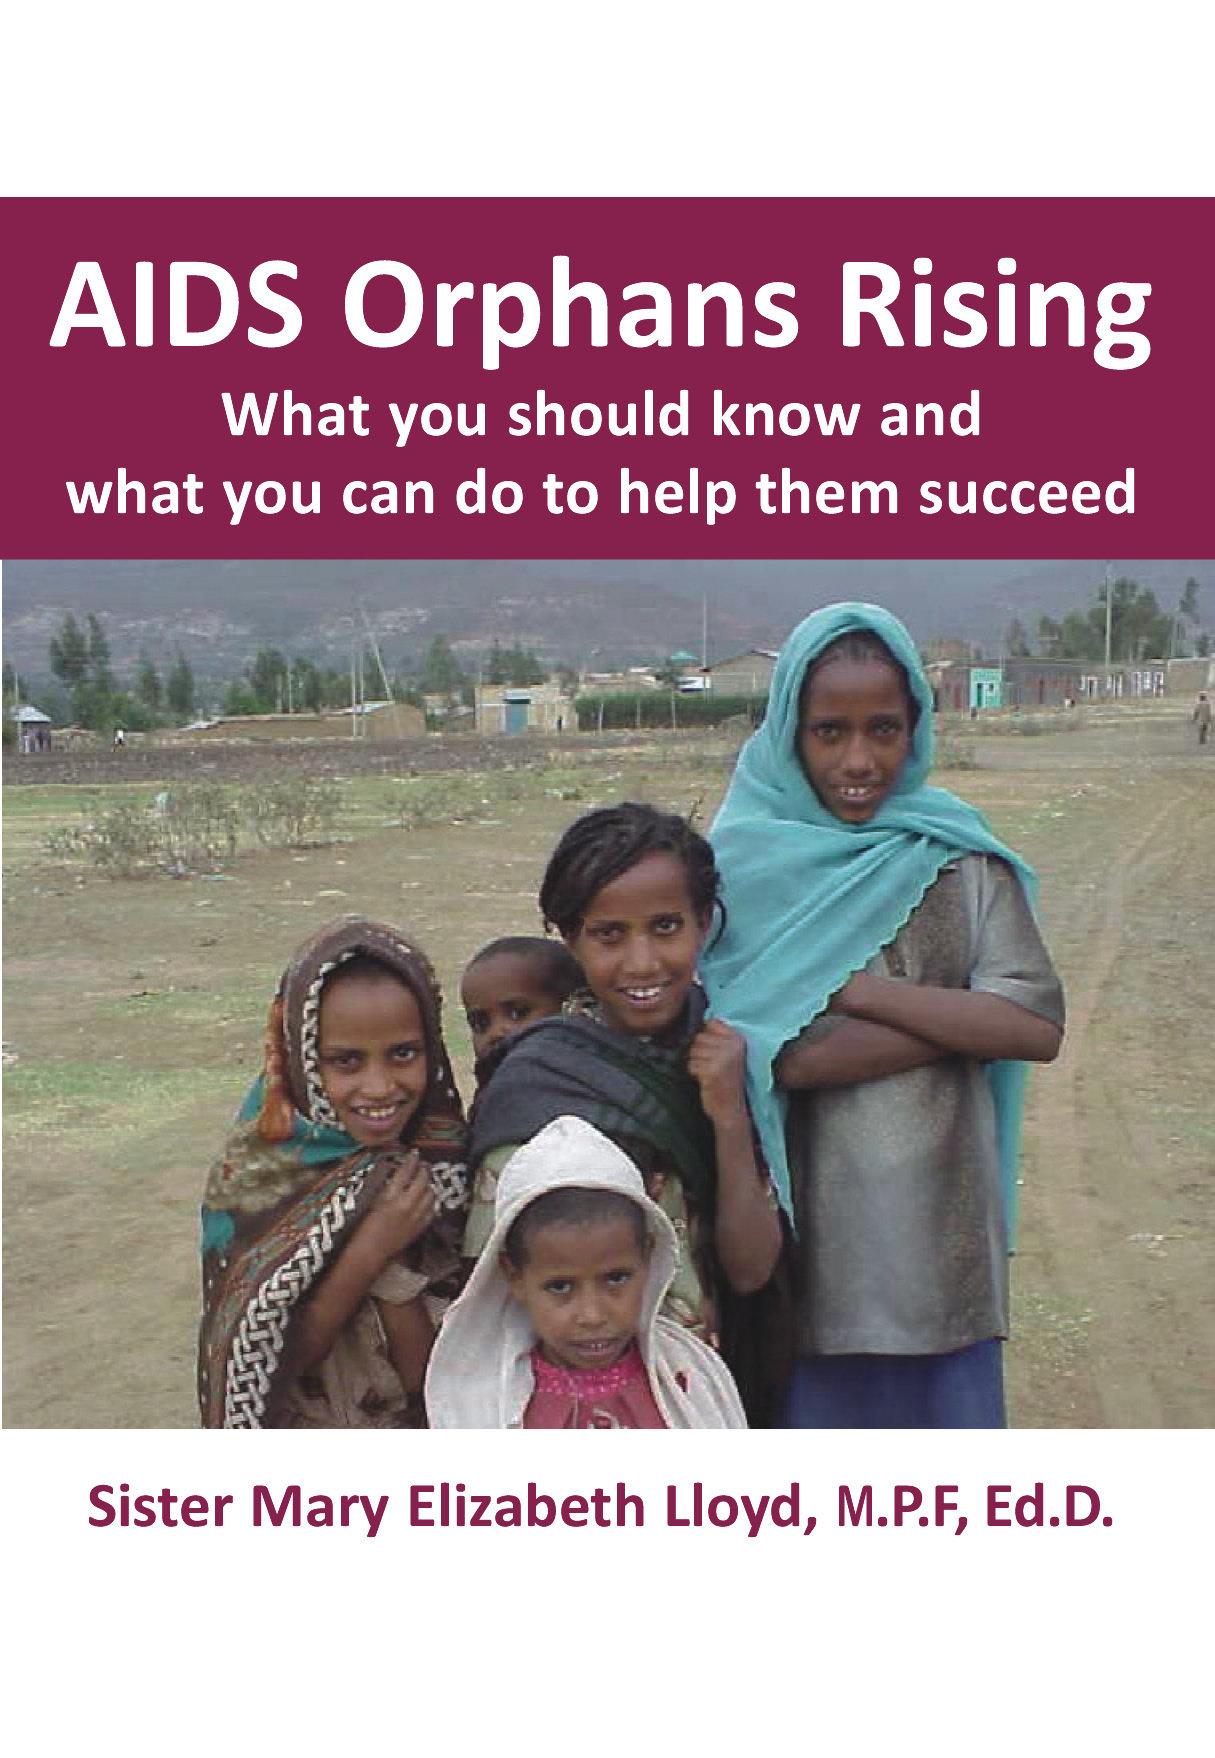 AIDS Orphans Rising 978-1-932690-47-7